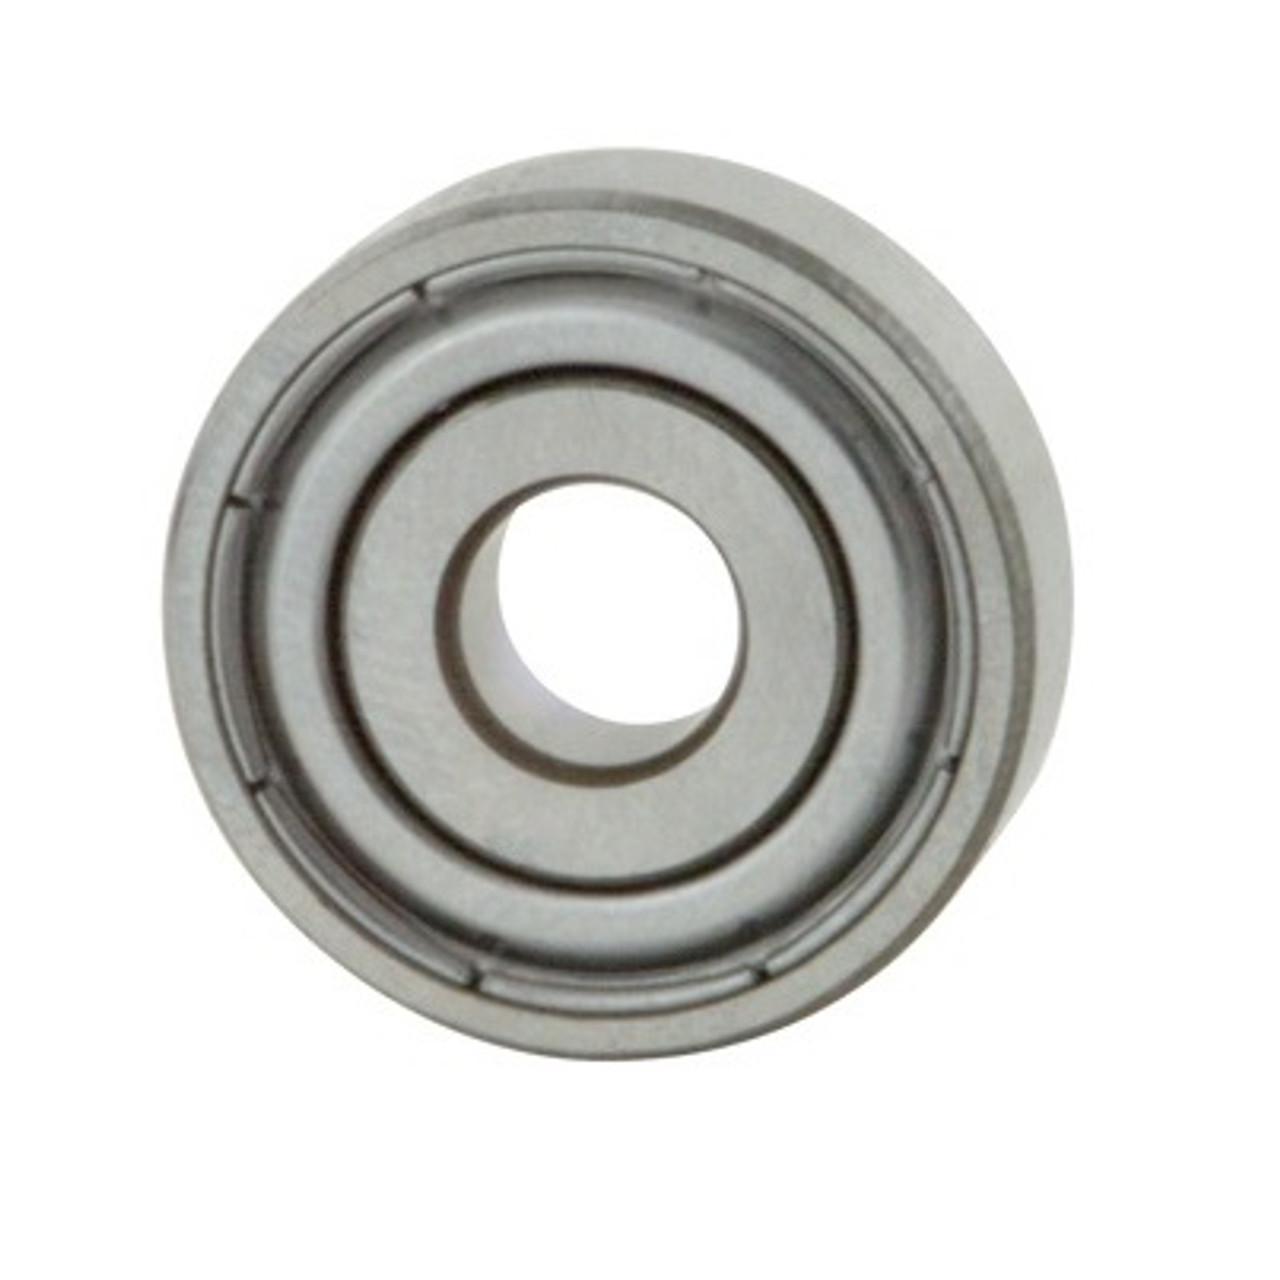 O-ring EU origin material variable pack 6,4 x 1,9 DIN 3770 ID x cross,mm